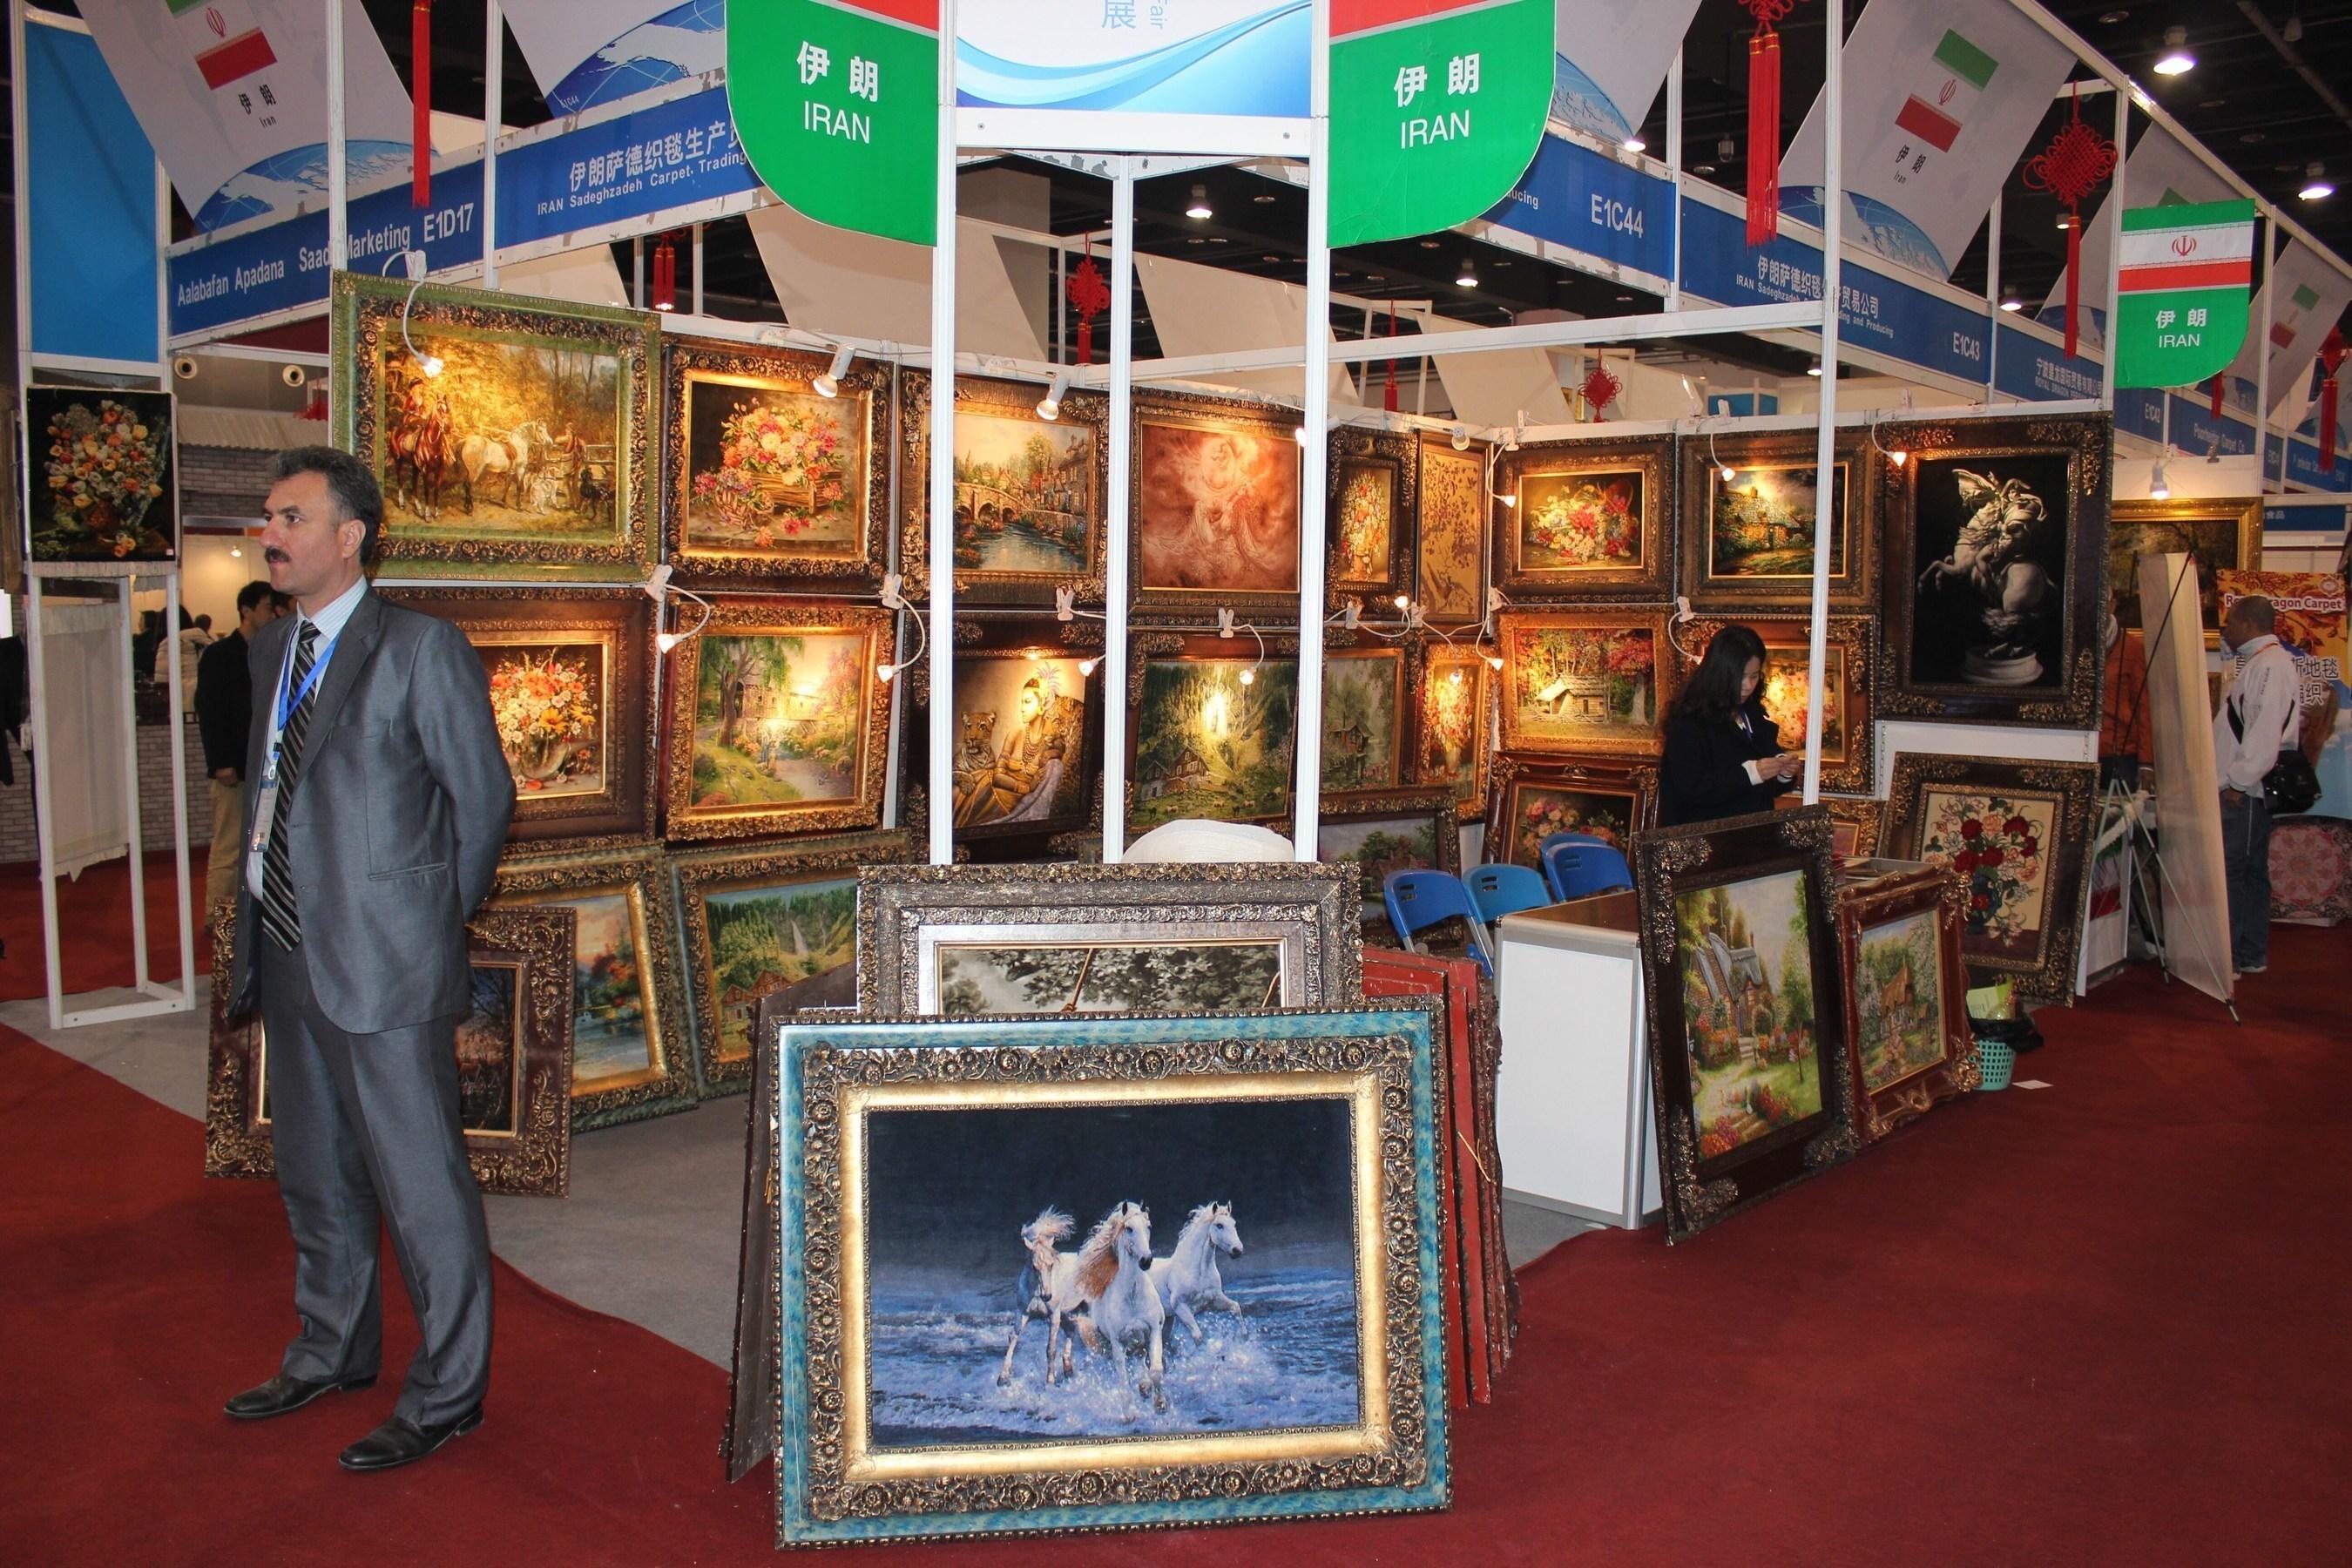 Yiwu Imported Commodities Fair 2015 sa bude konať od 4. do 7. júna 2015